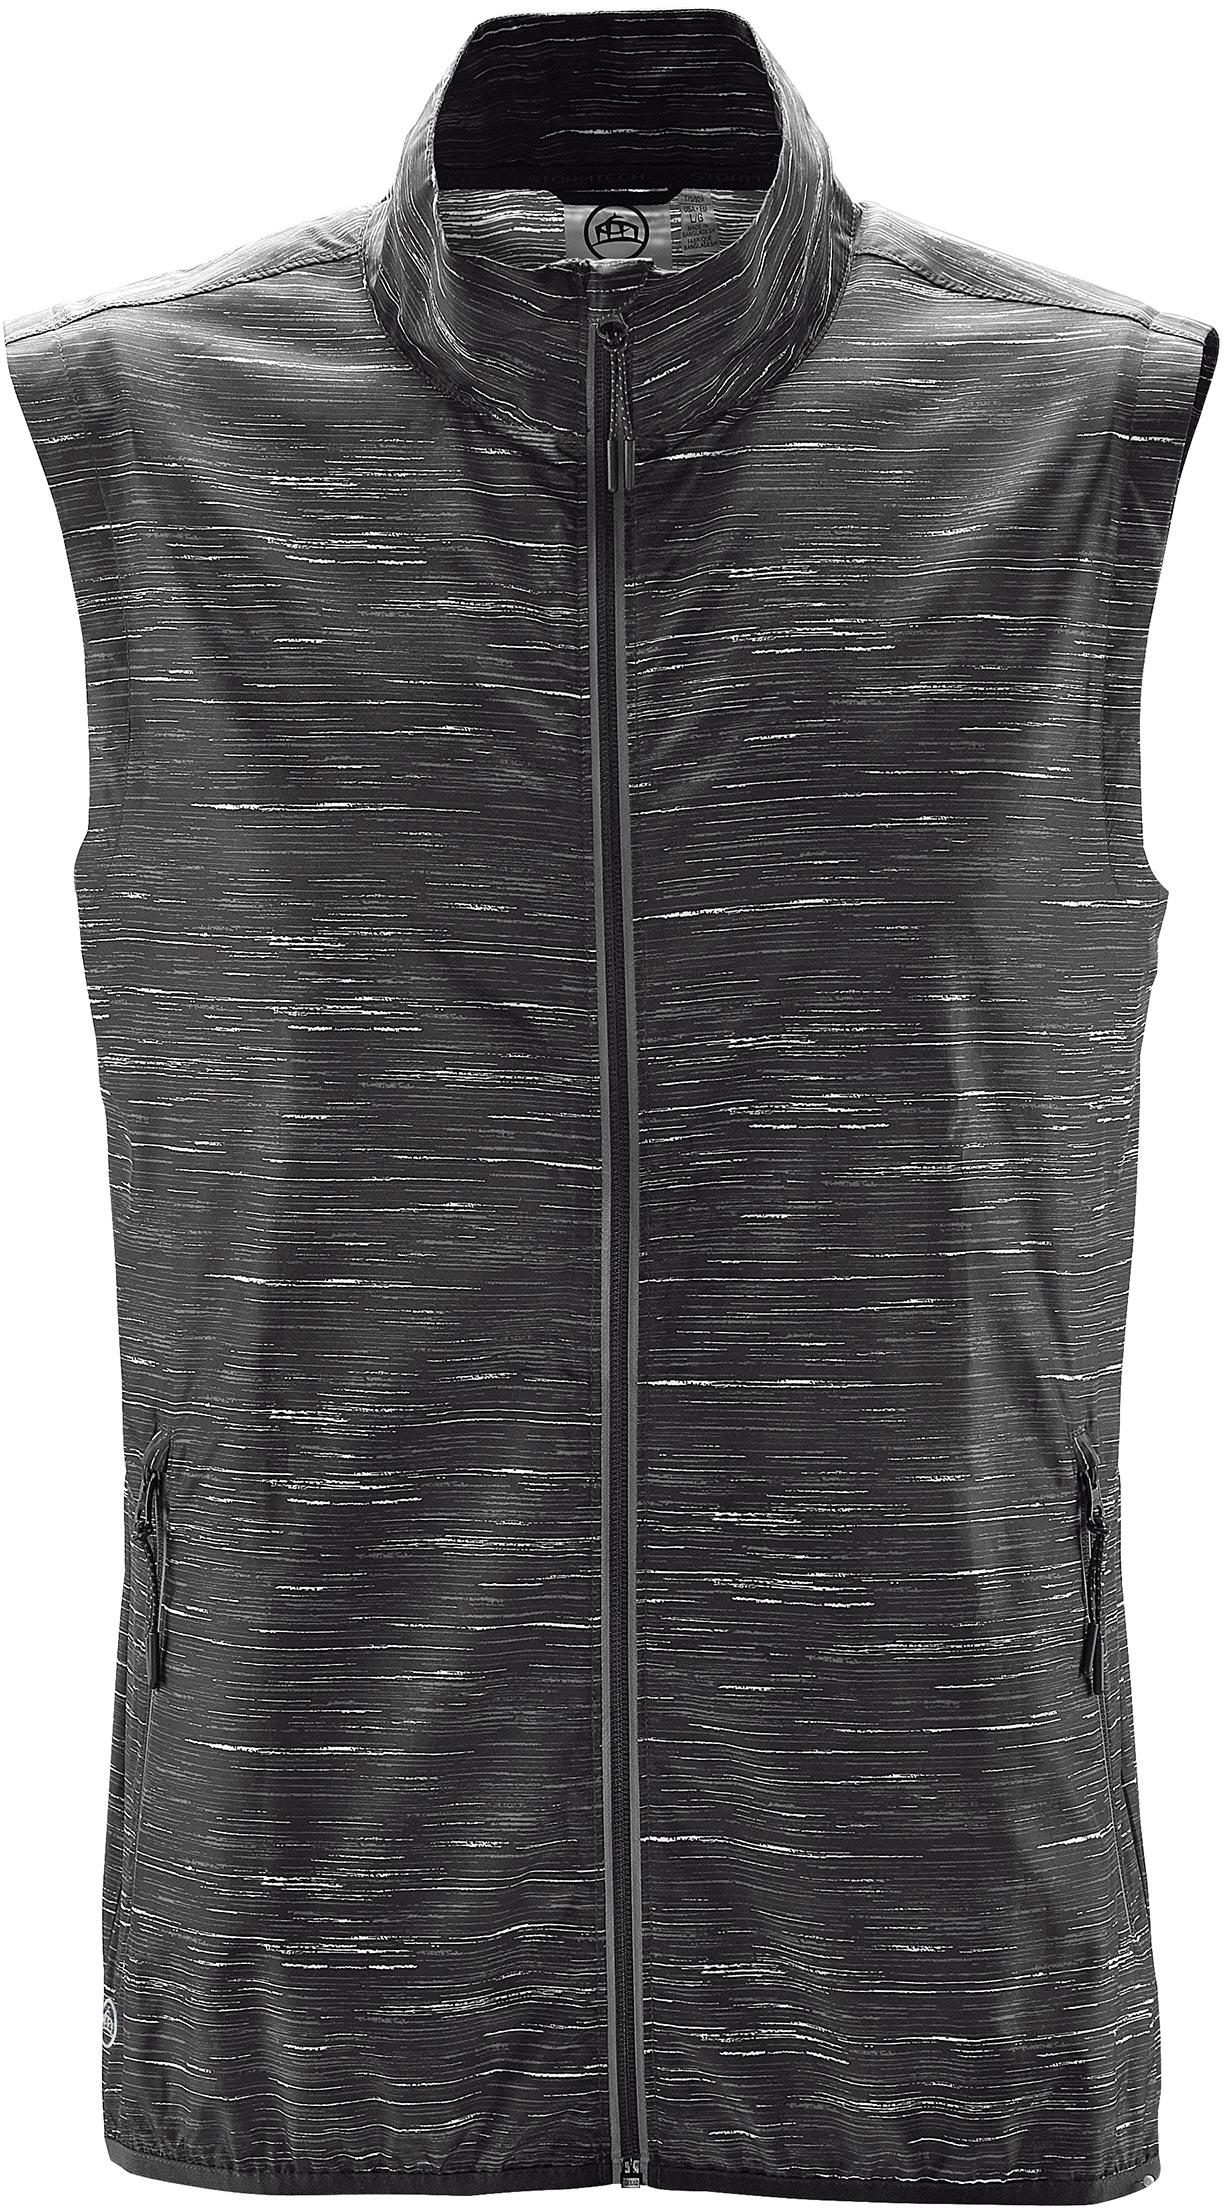 Stormtech APV-1 - Men's Ozone Lightweight Shell Vest